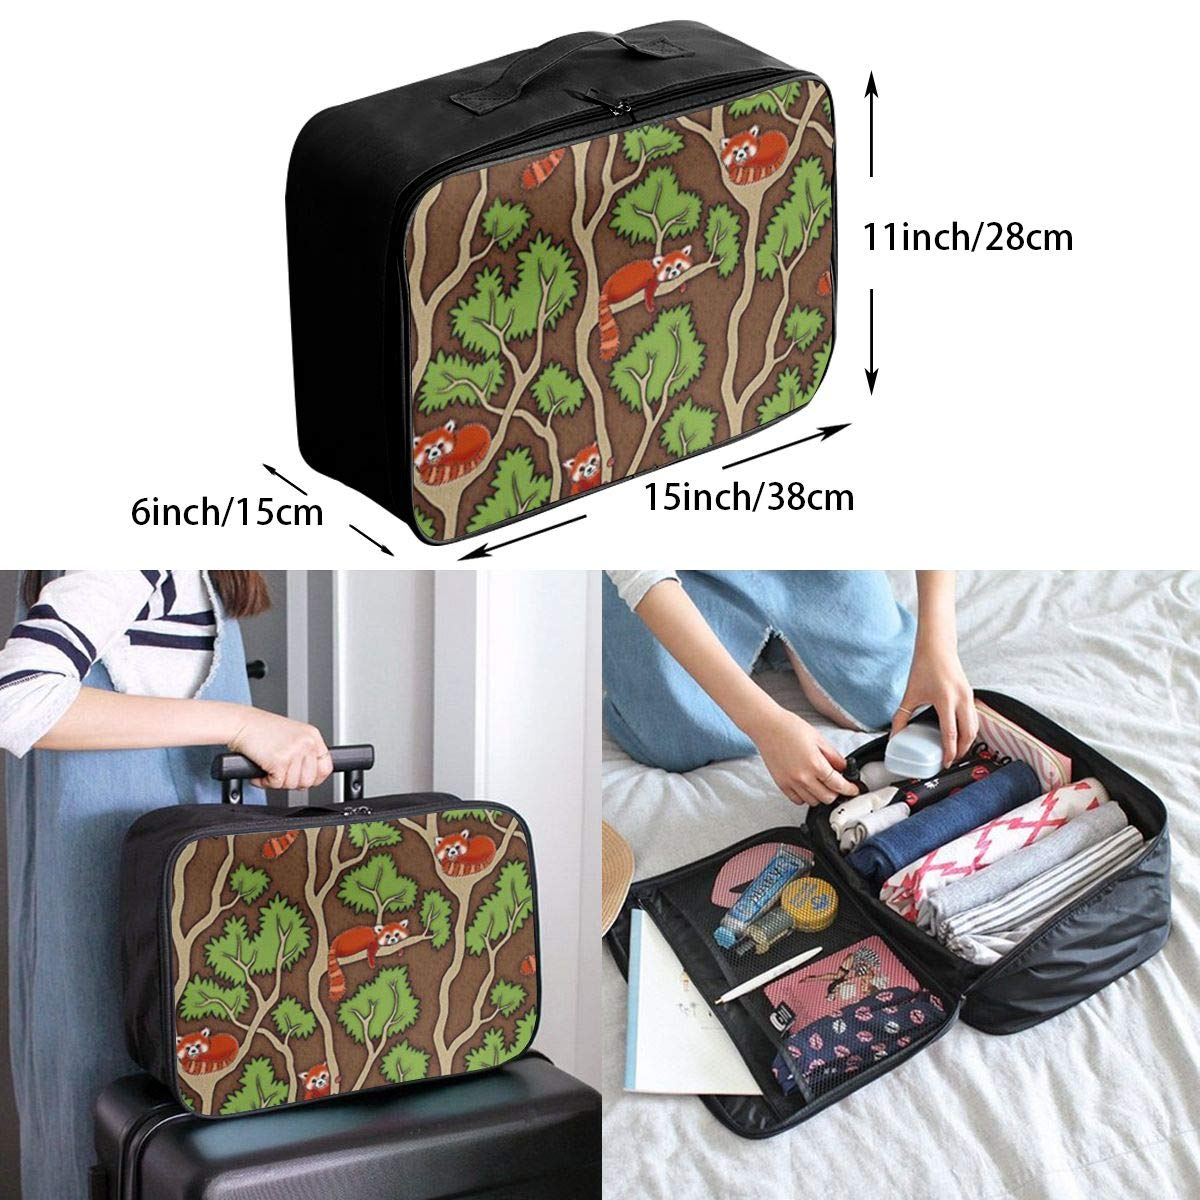 ADGAI Forest Red Panda Canvas Travel Weekender Bag,Fashion Custom Lightweight Large Capacity Portable Luggage Bag,Suitcase Trolley Bag